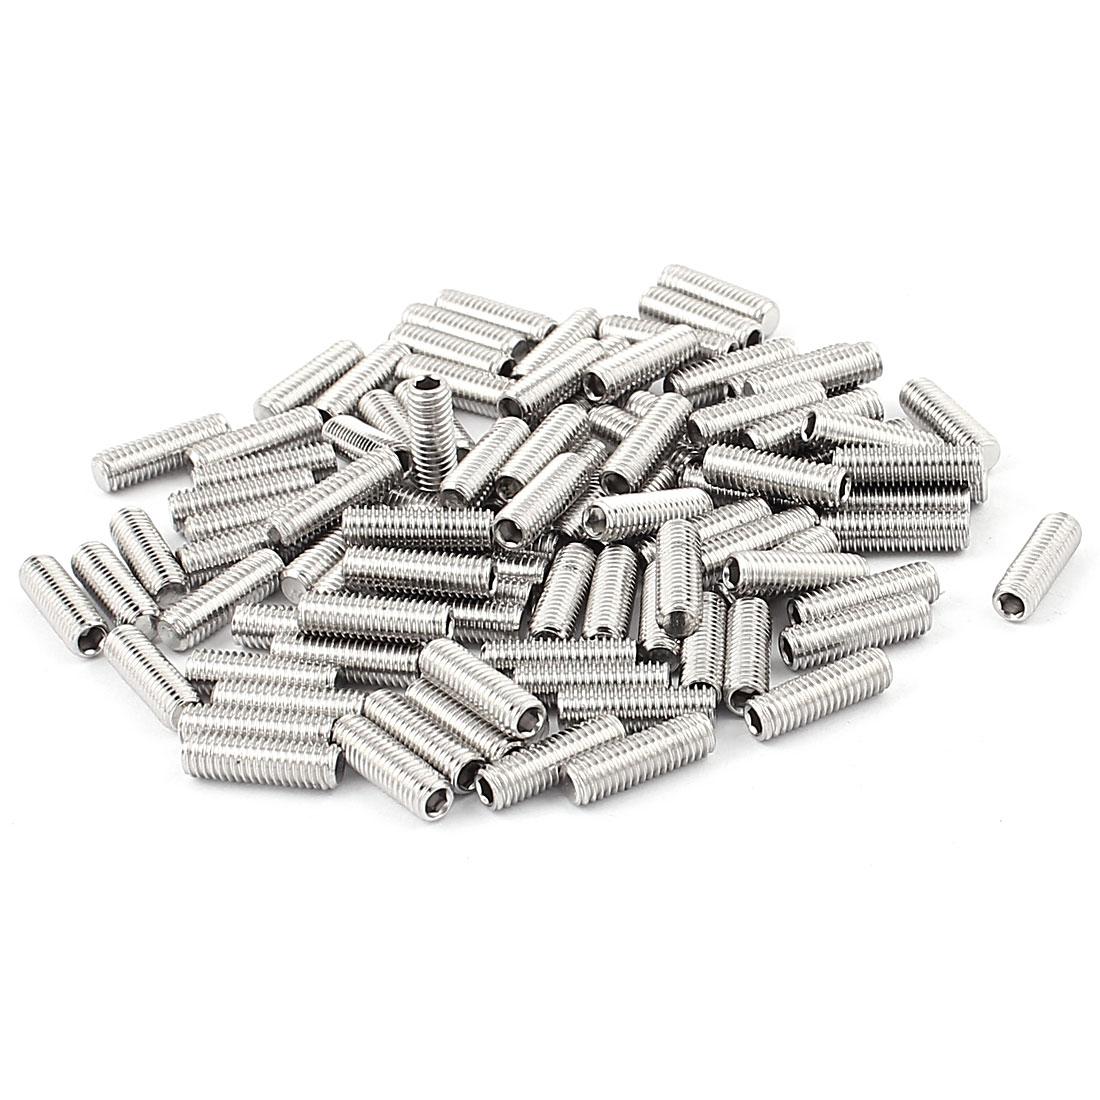 Stainless Steel M5x16mm Hex Socket Flat Point Grub Screws 100Pcs